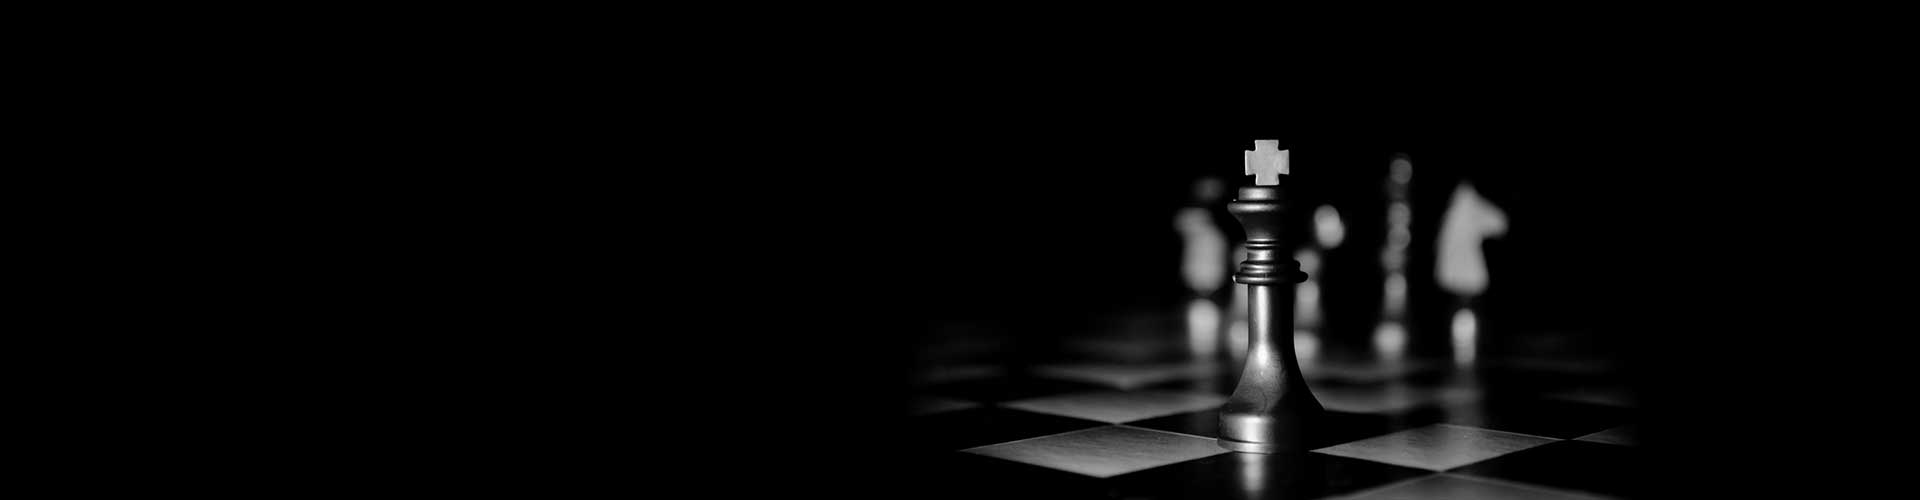 chess learn